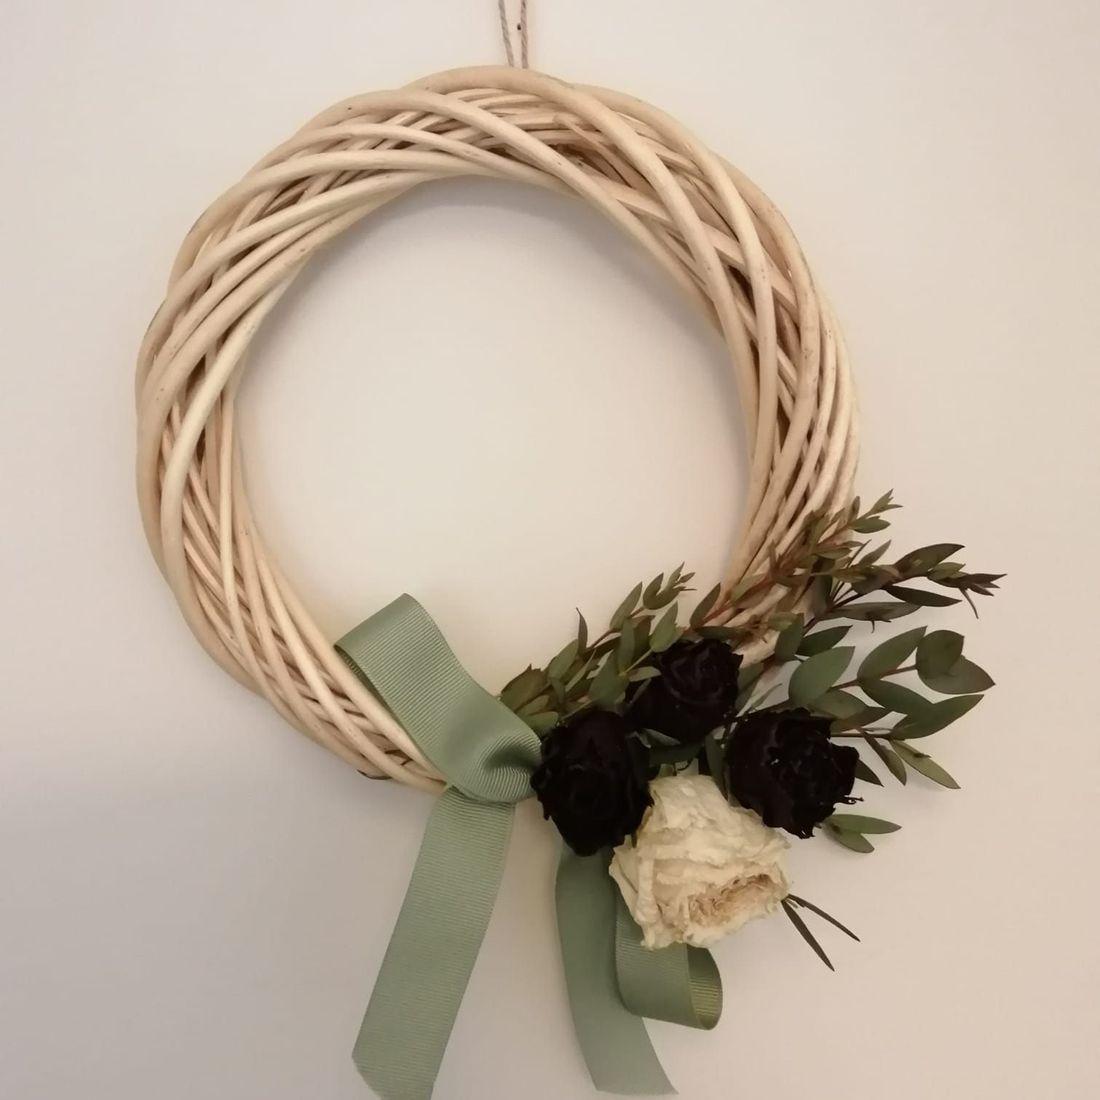 Rustic Flower Wreath